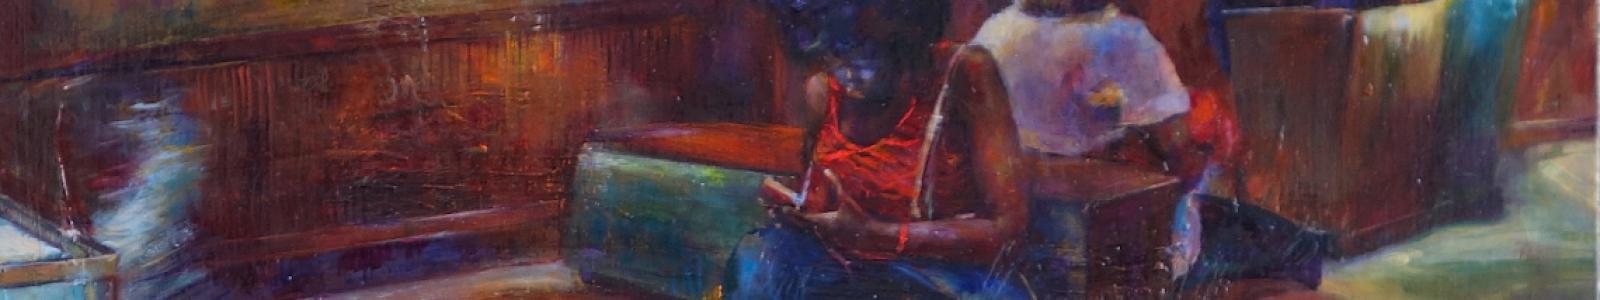 Gallery Svetlana Malakhova